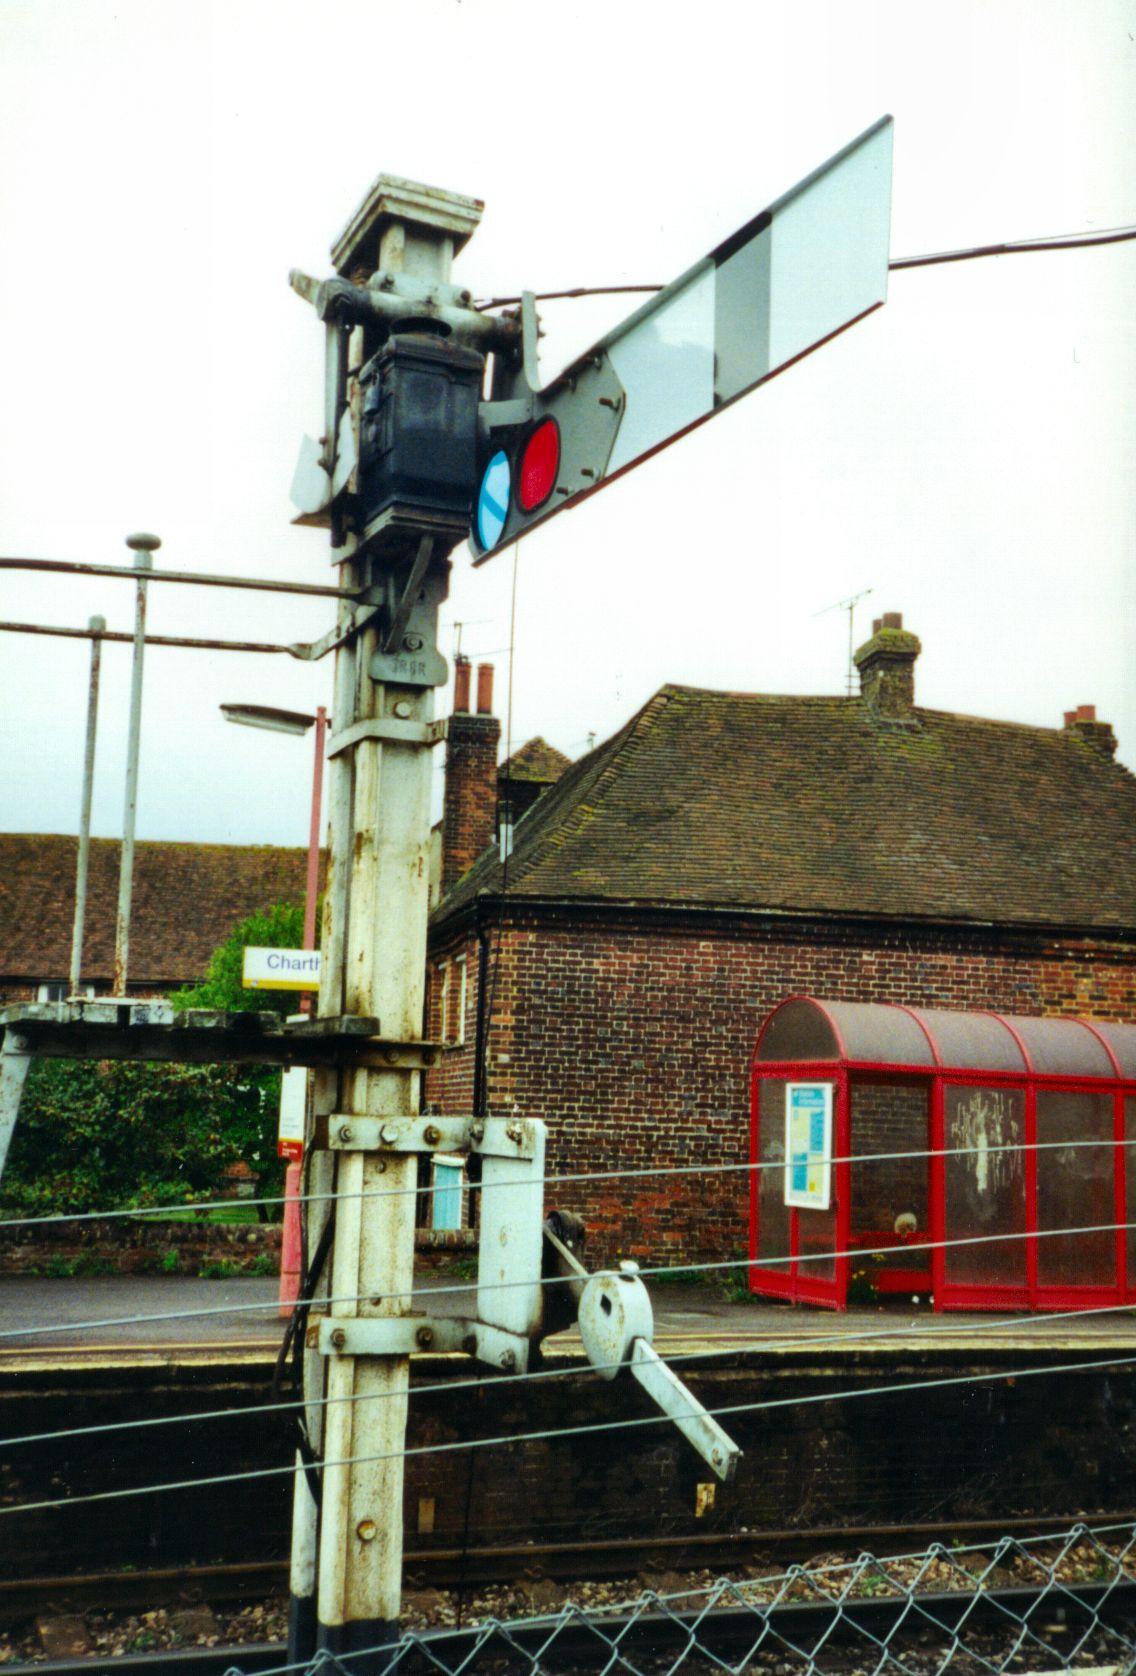 Railway Semaphore Signal Simple English Wikipedia The